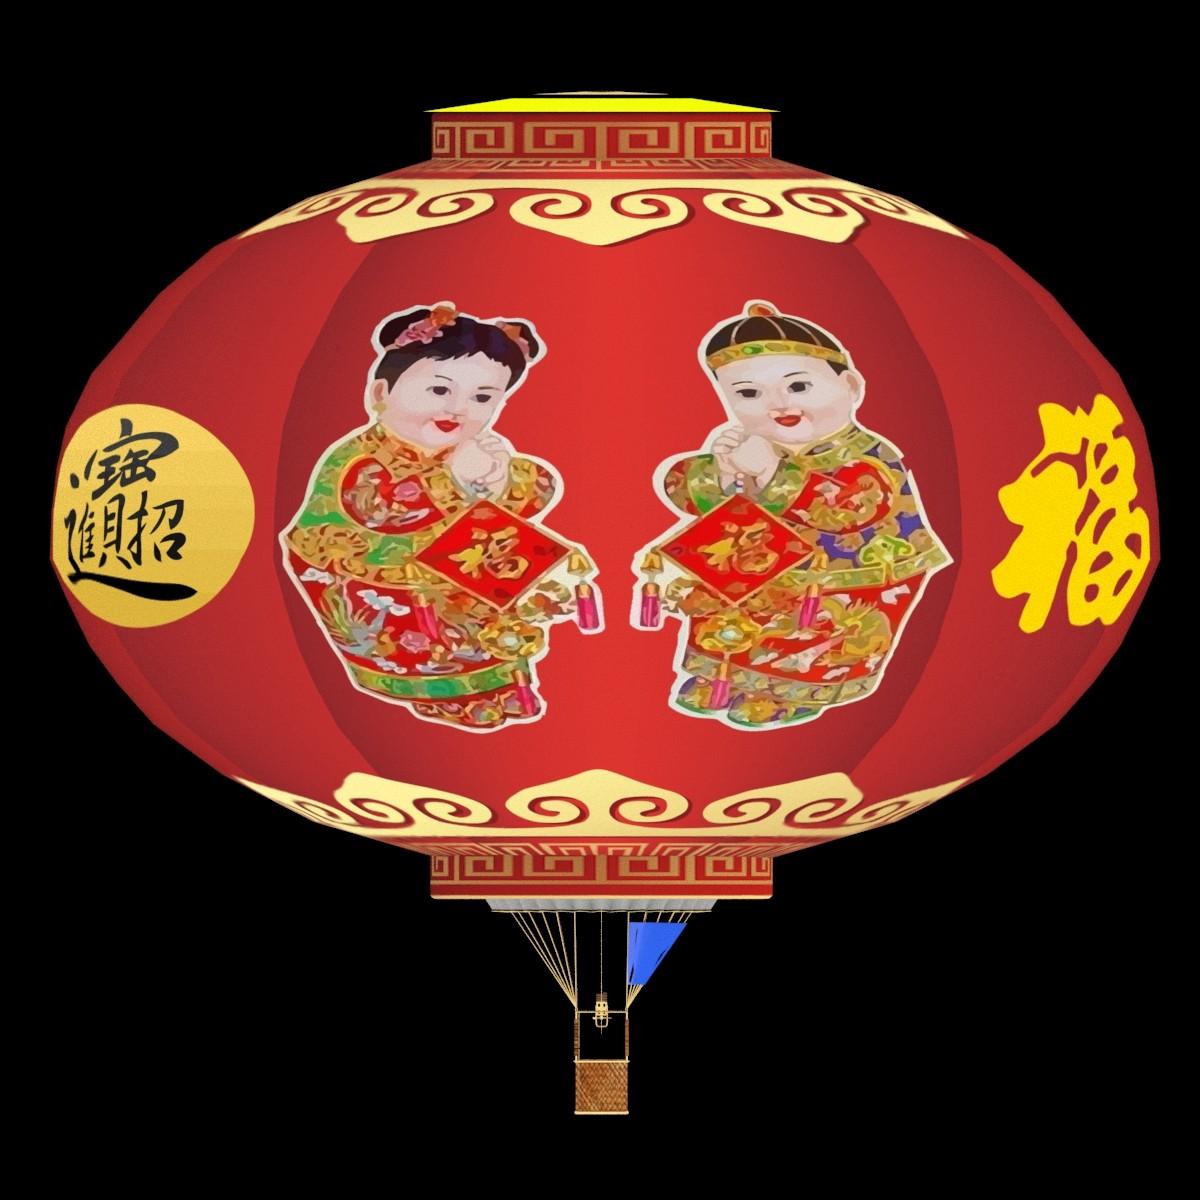 chinese_red_lantern_hot_air_balloon_fire1.jpg